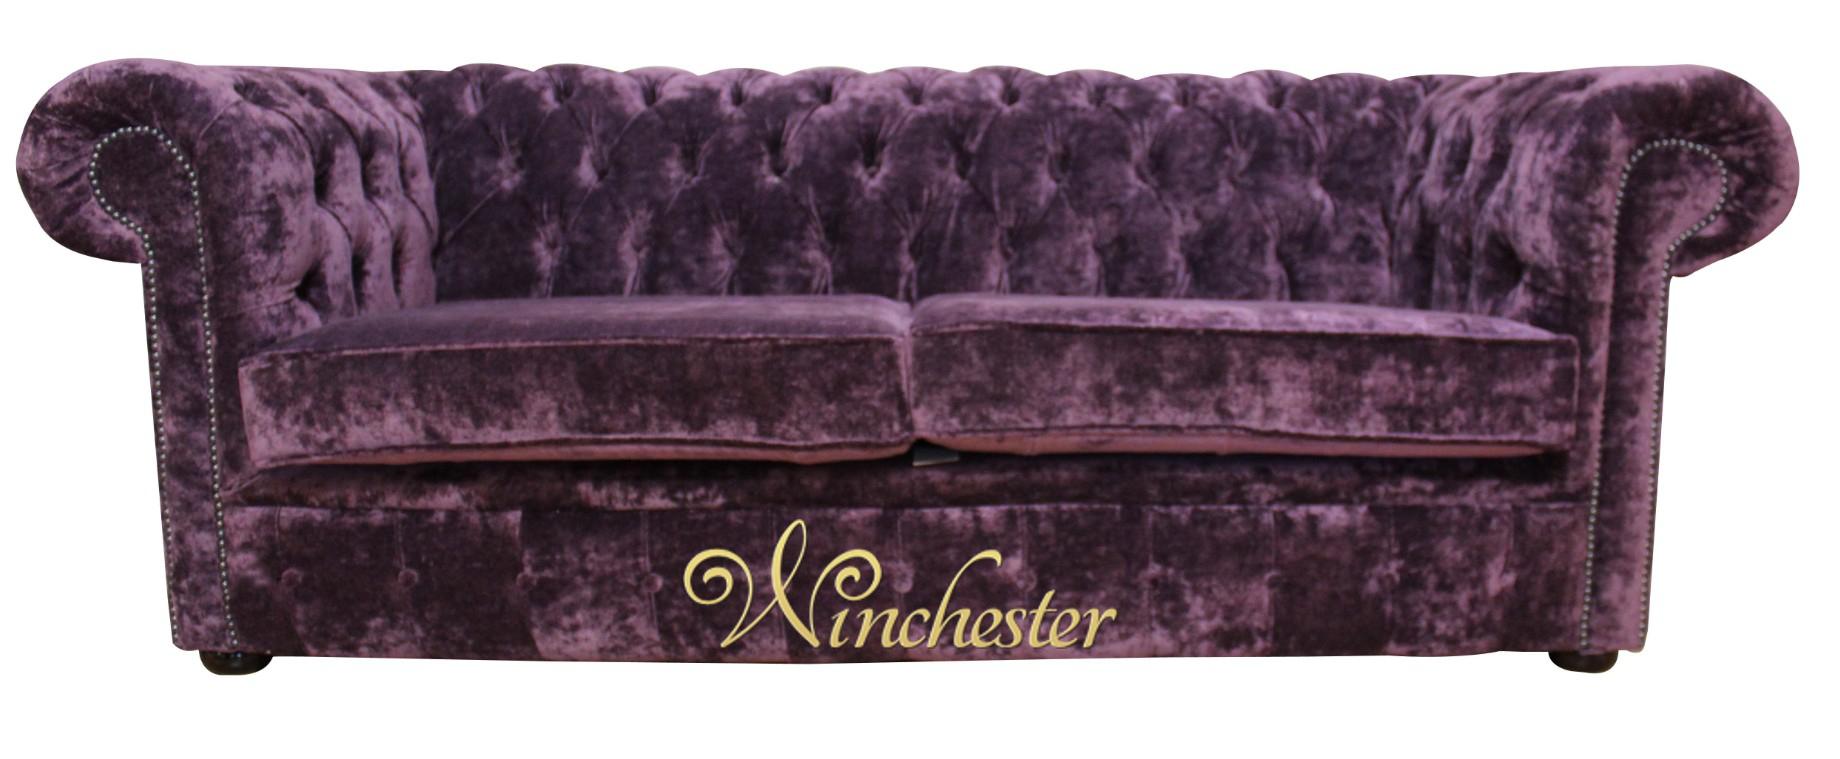 Aubergine Leather Sofa Grover Leather Sofa Brighton Aubergine ...